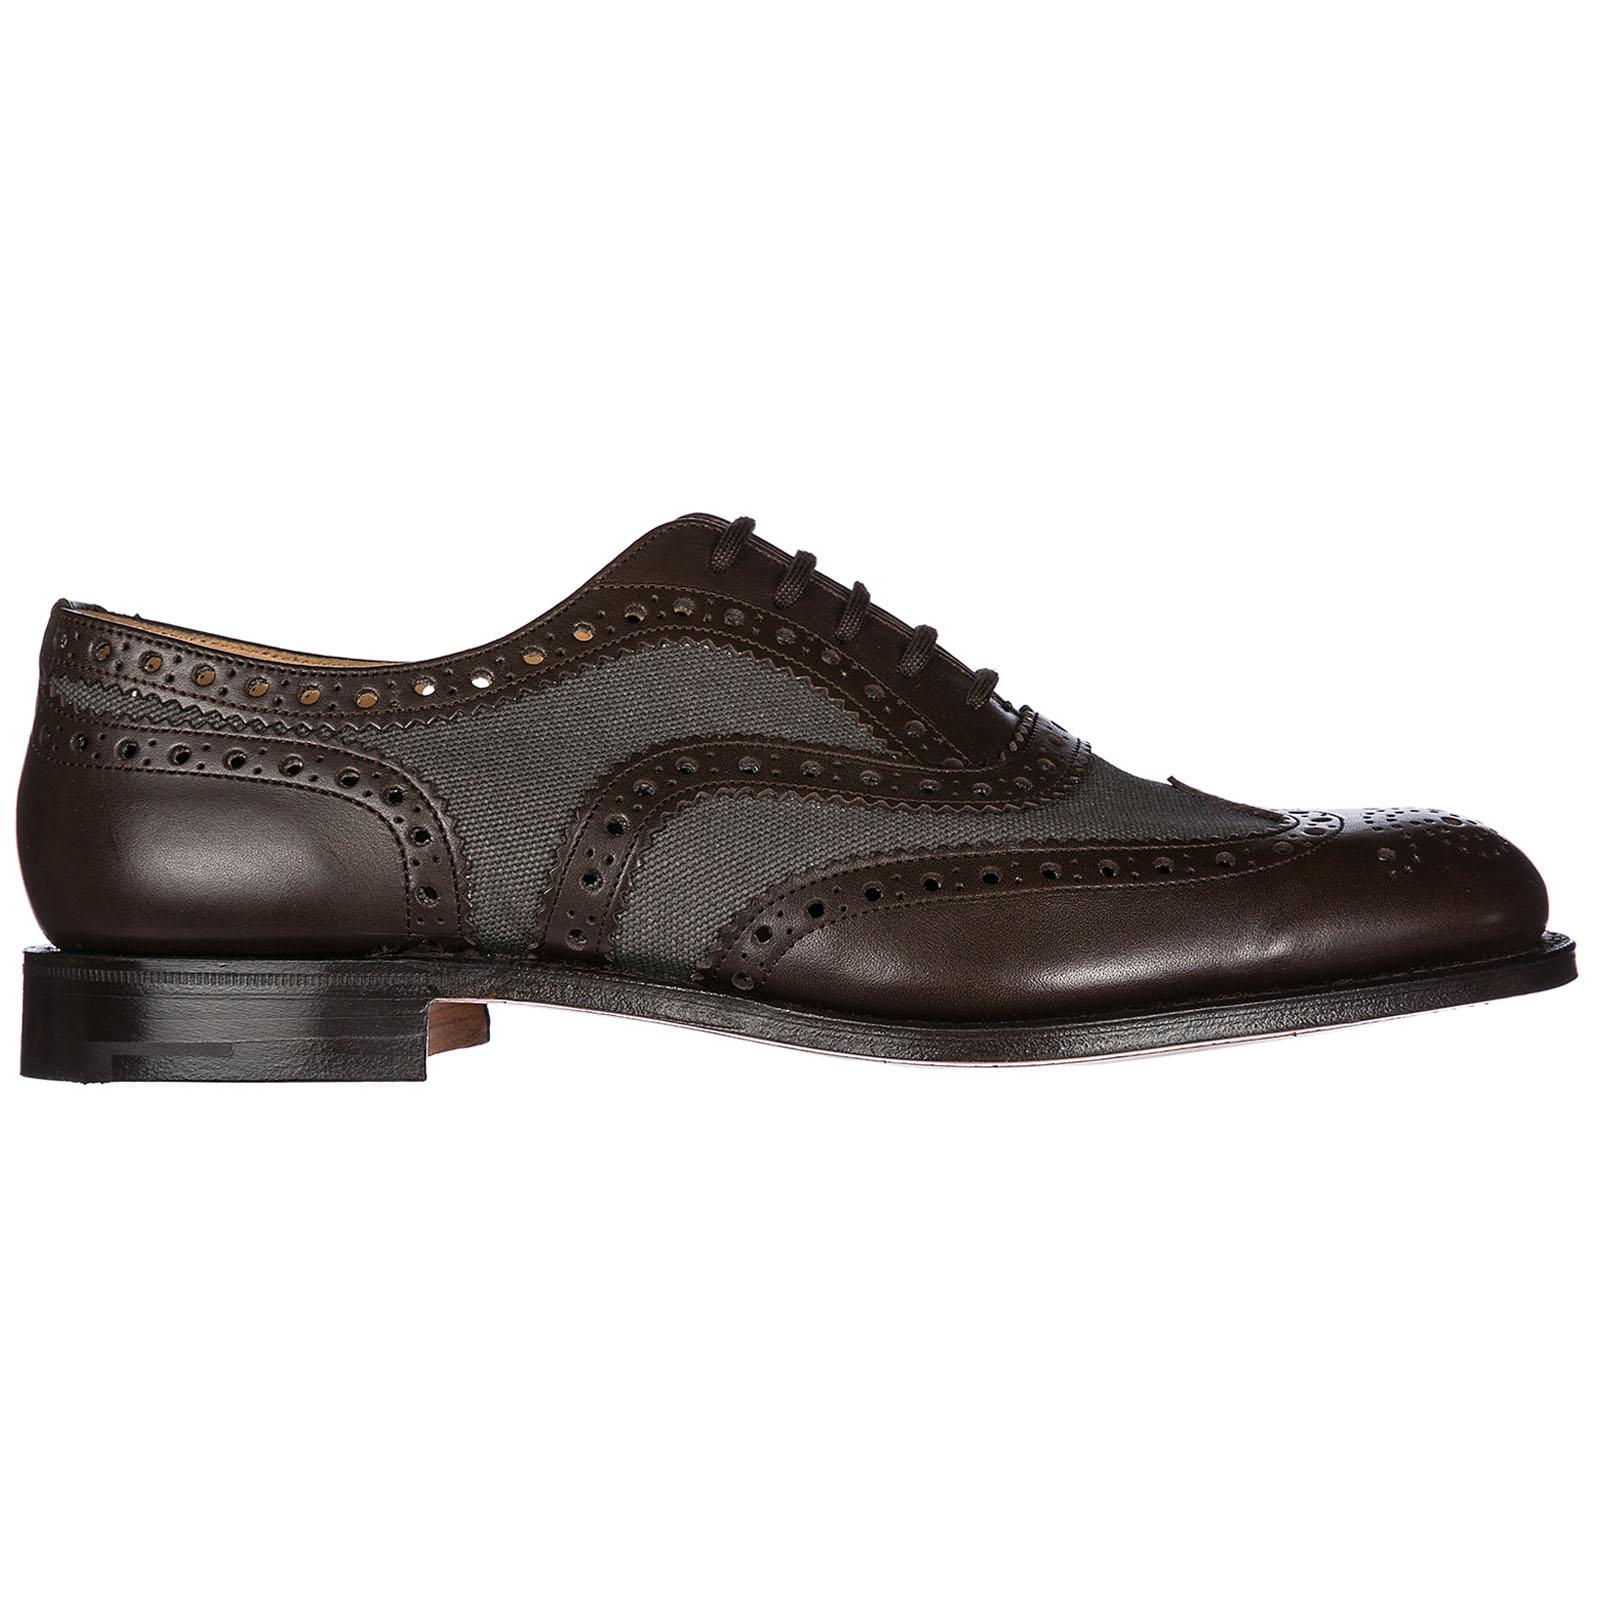 Herrenschuhe Leder Herren Business Schuhe Schnürschuhe Burwood Brogue, Brown